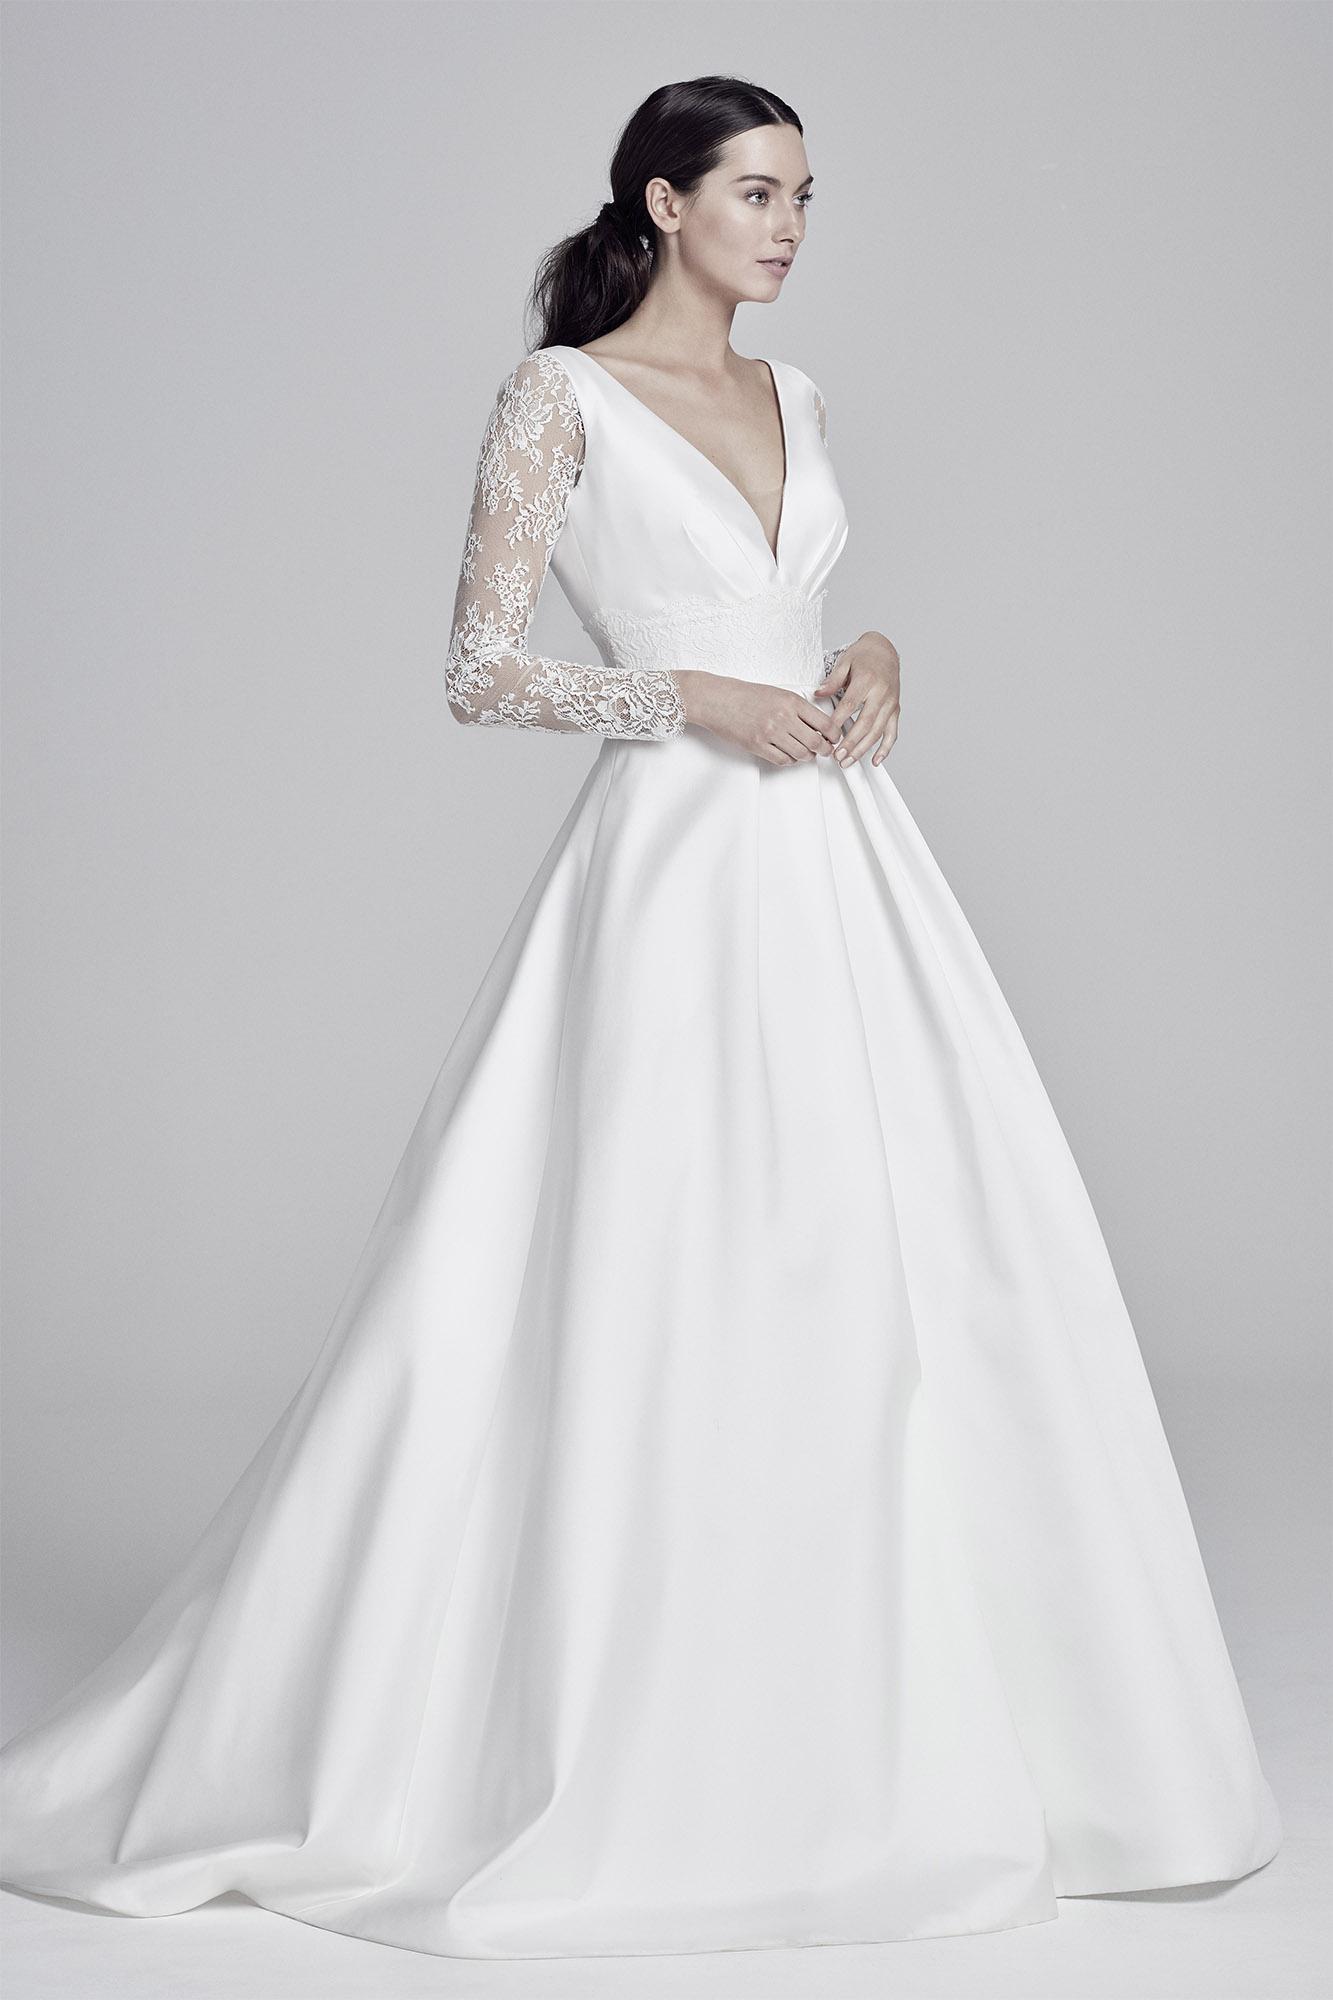 Beatrix | Lookbook Collection 2019 | designer wedding dresses by Suzanne Neville